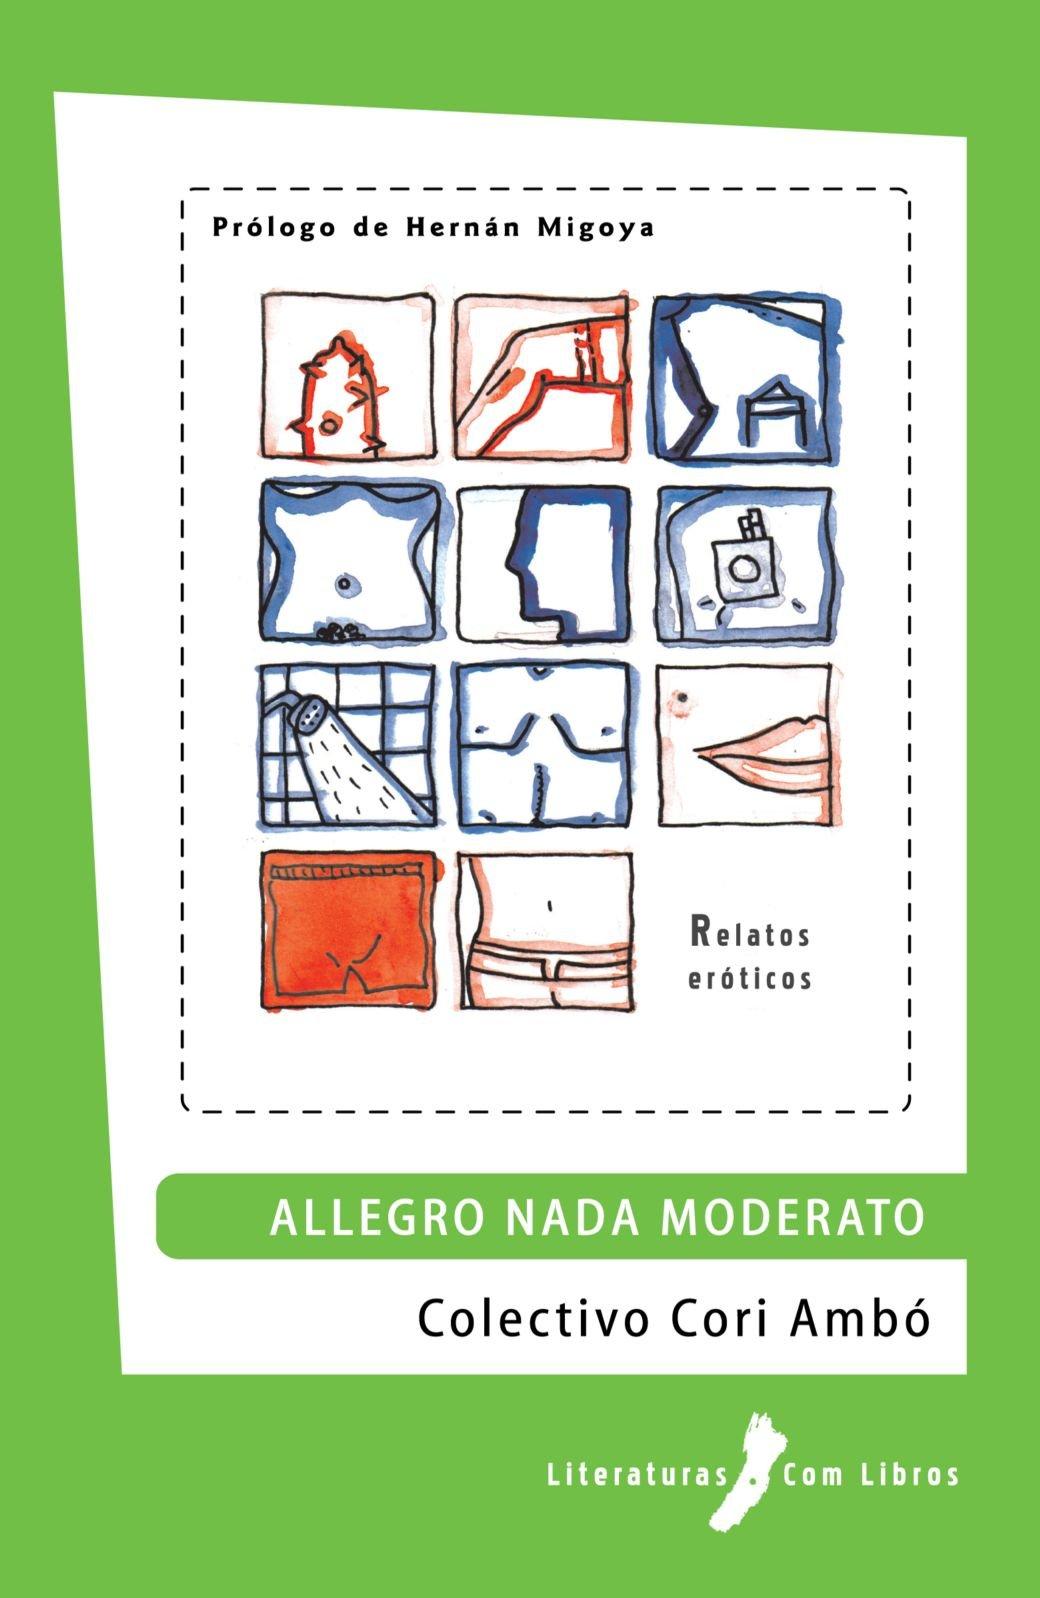 Allegro nada moderato (Spanish Edition): Antonio Paniagua, Paloma Acebes, Gloria Fern?ndez Rozas, Ana P?rez Ca?amares, Isabel Mart?n Cordero: 9788460944058: ...